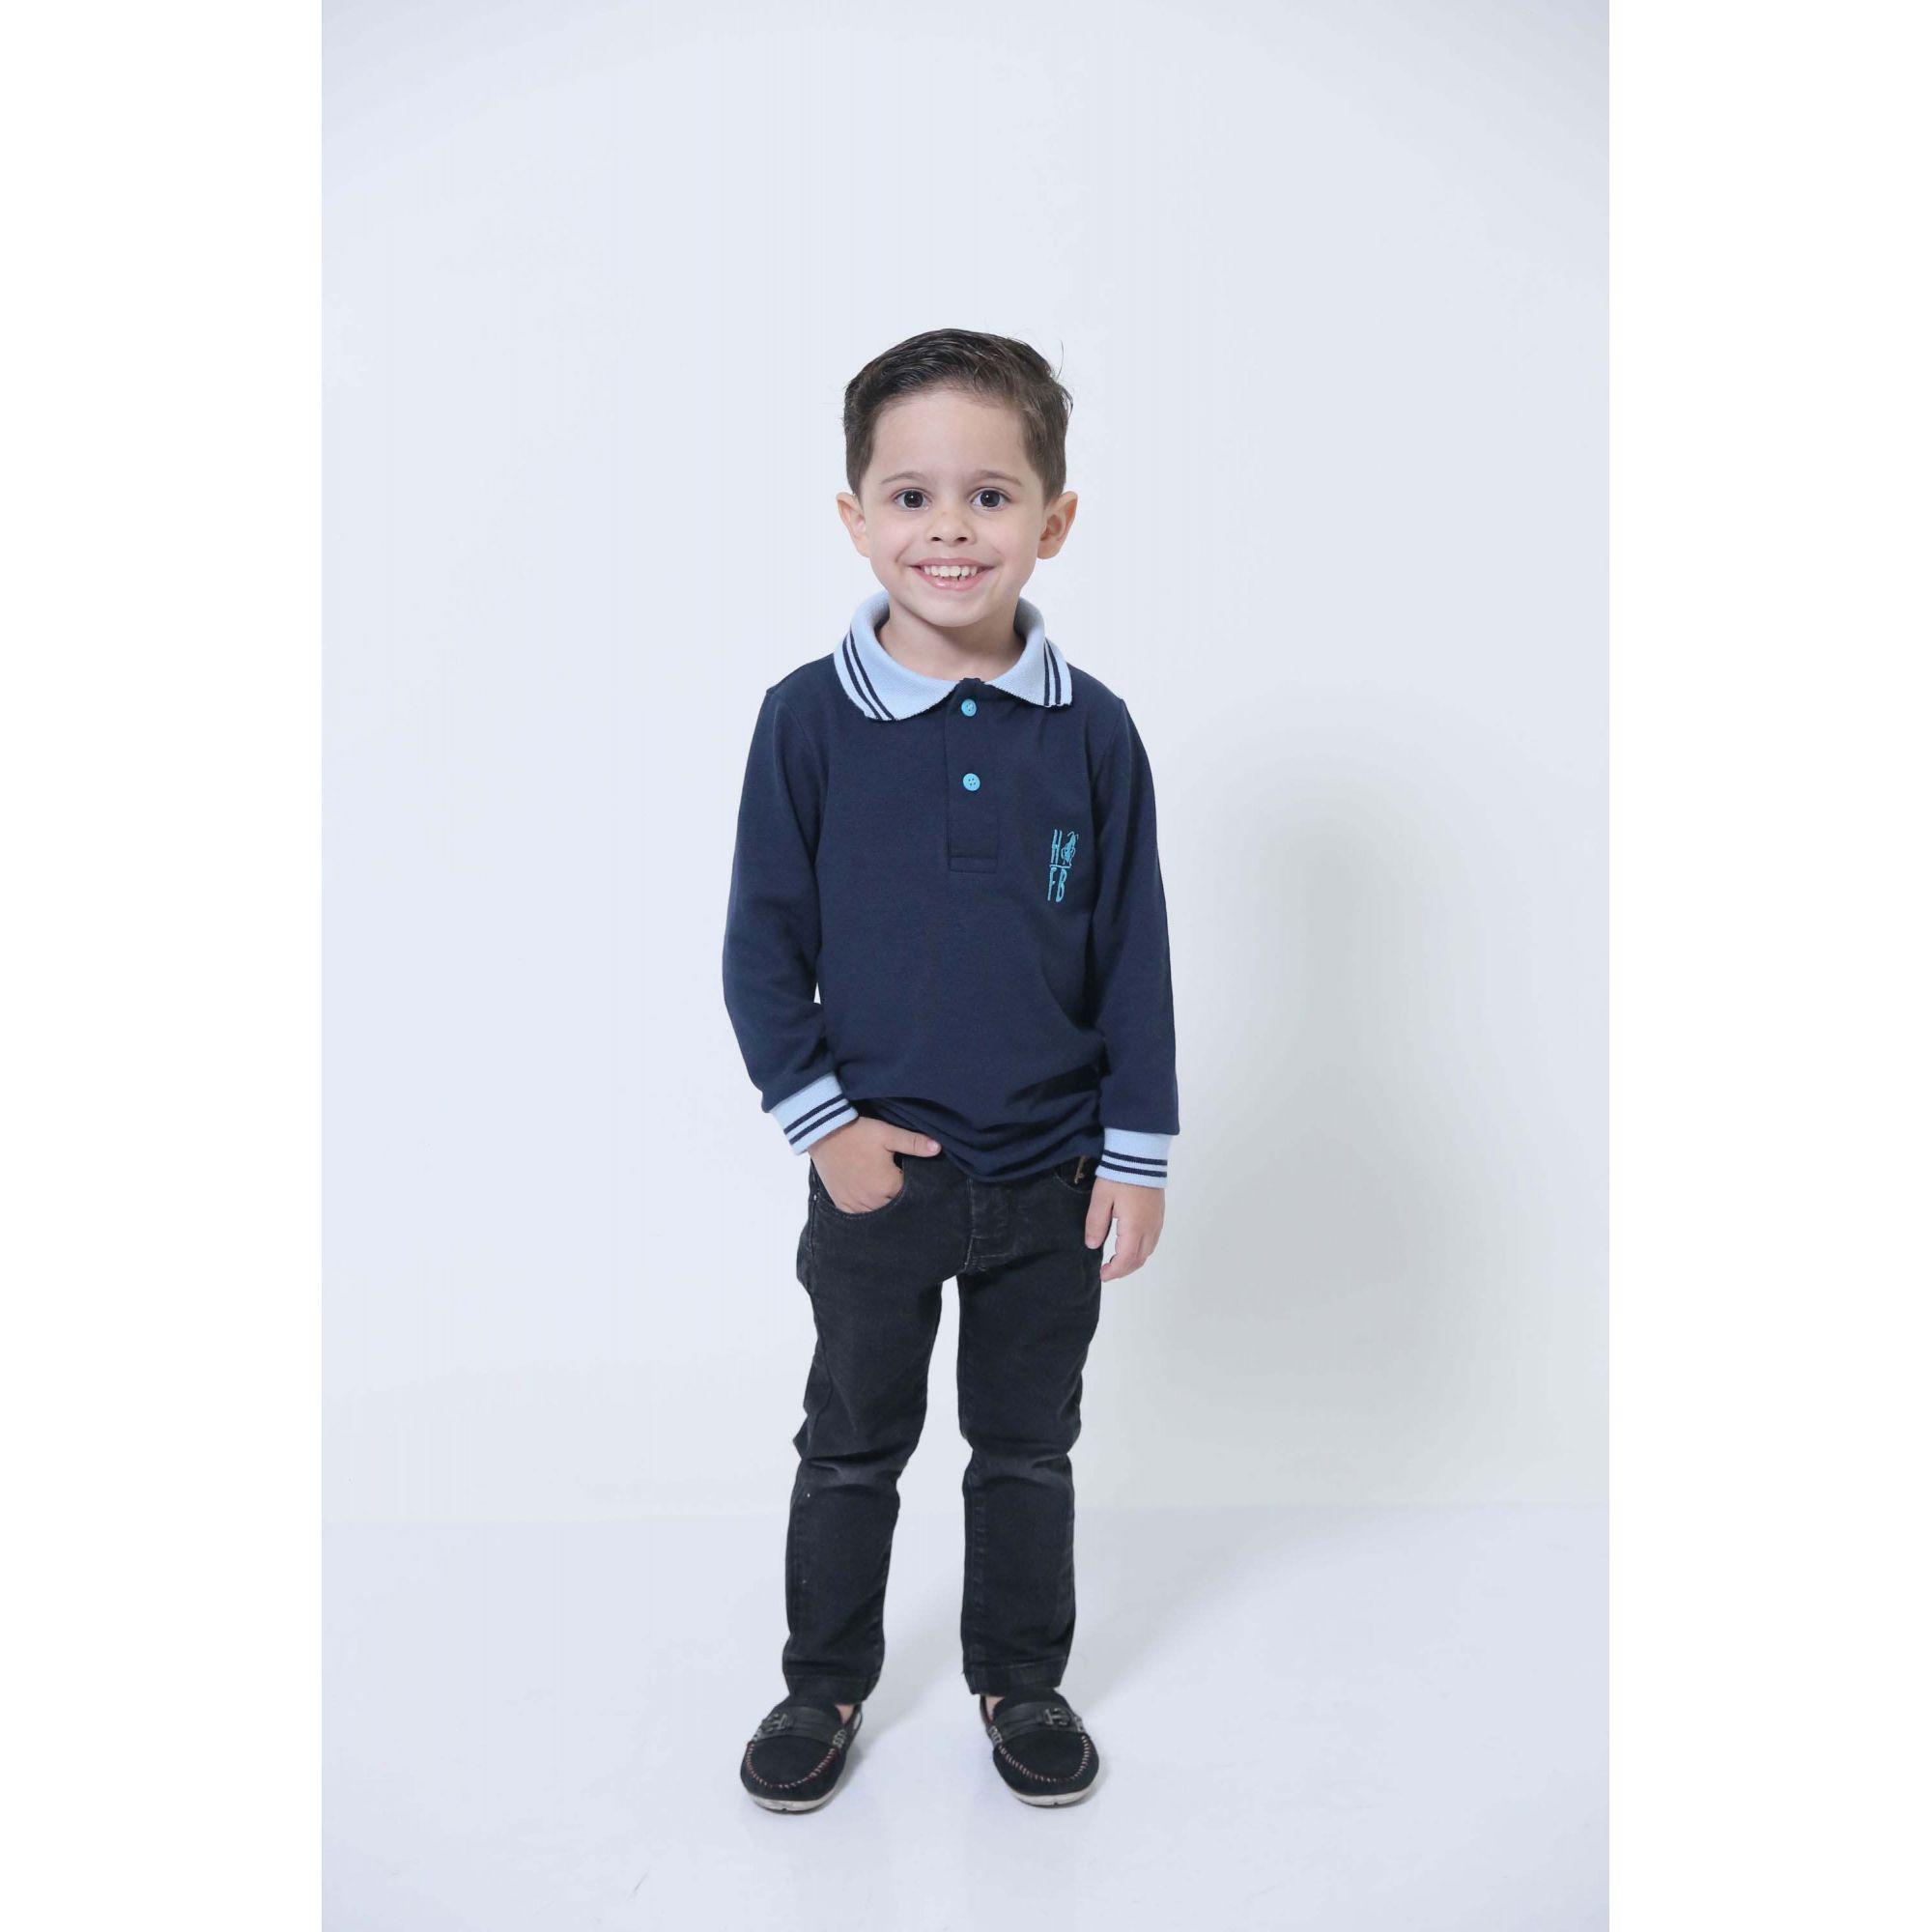 PAI E FILHO > Kit 02 Camisas Polos  ou Body Infantil Azul Manga Longa [Coleção Tal Pai Tal Filho]  - Heitor Fashion Brazil